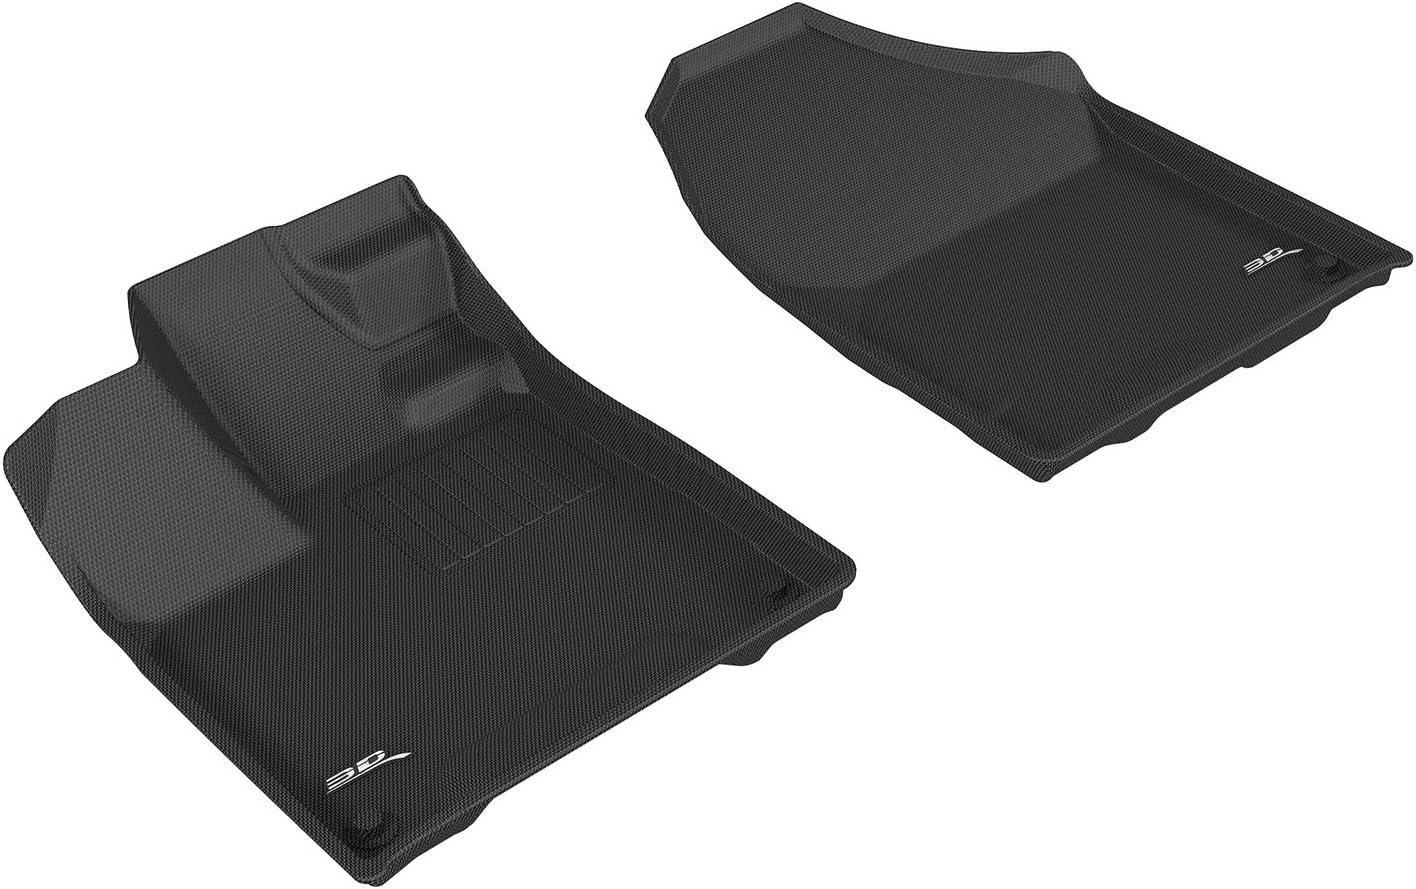 Kagu Rubber 3D MAXpider Complete Set Custom Fit All-Weather Floor Mat for Select Honda Pilot Models Gray